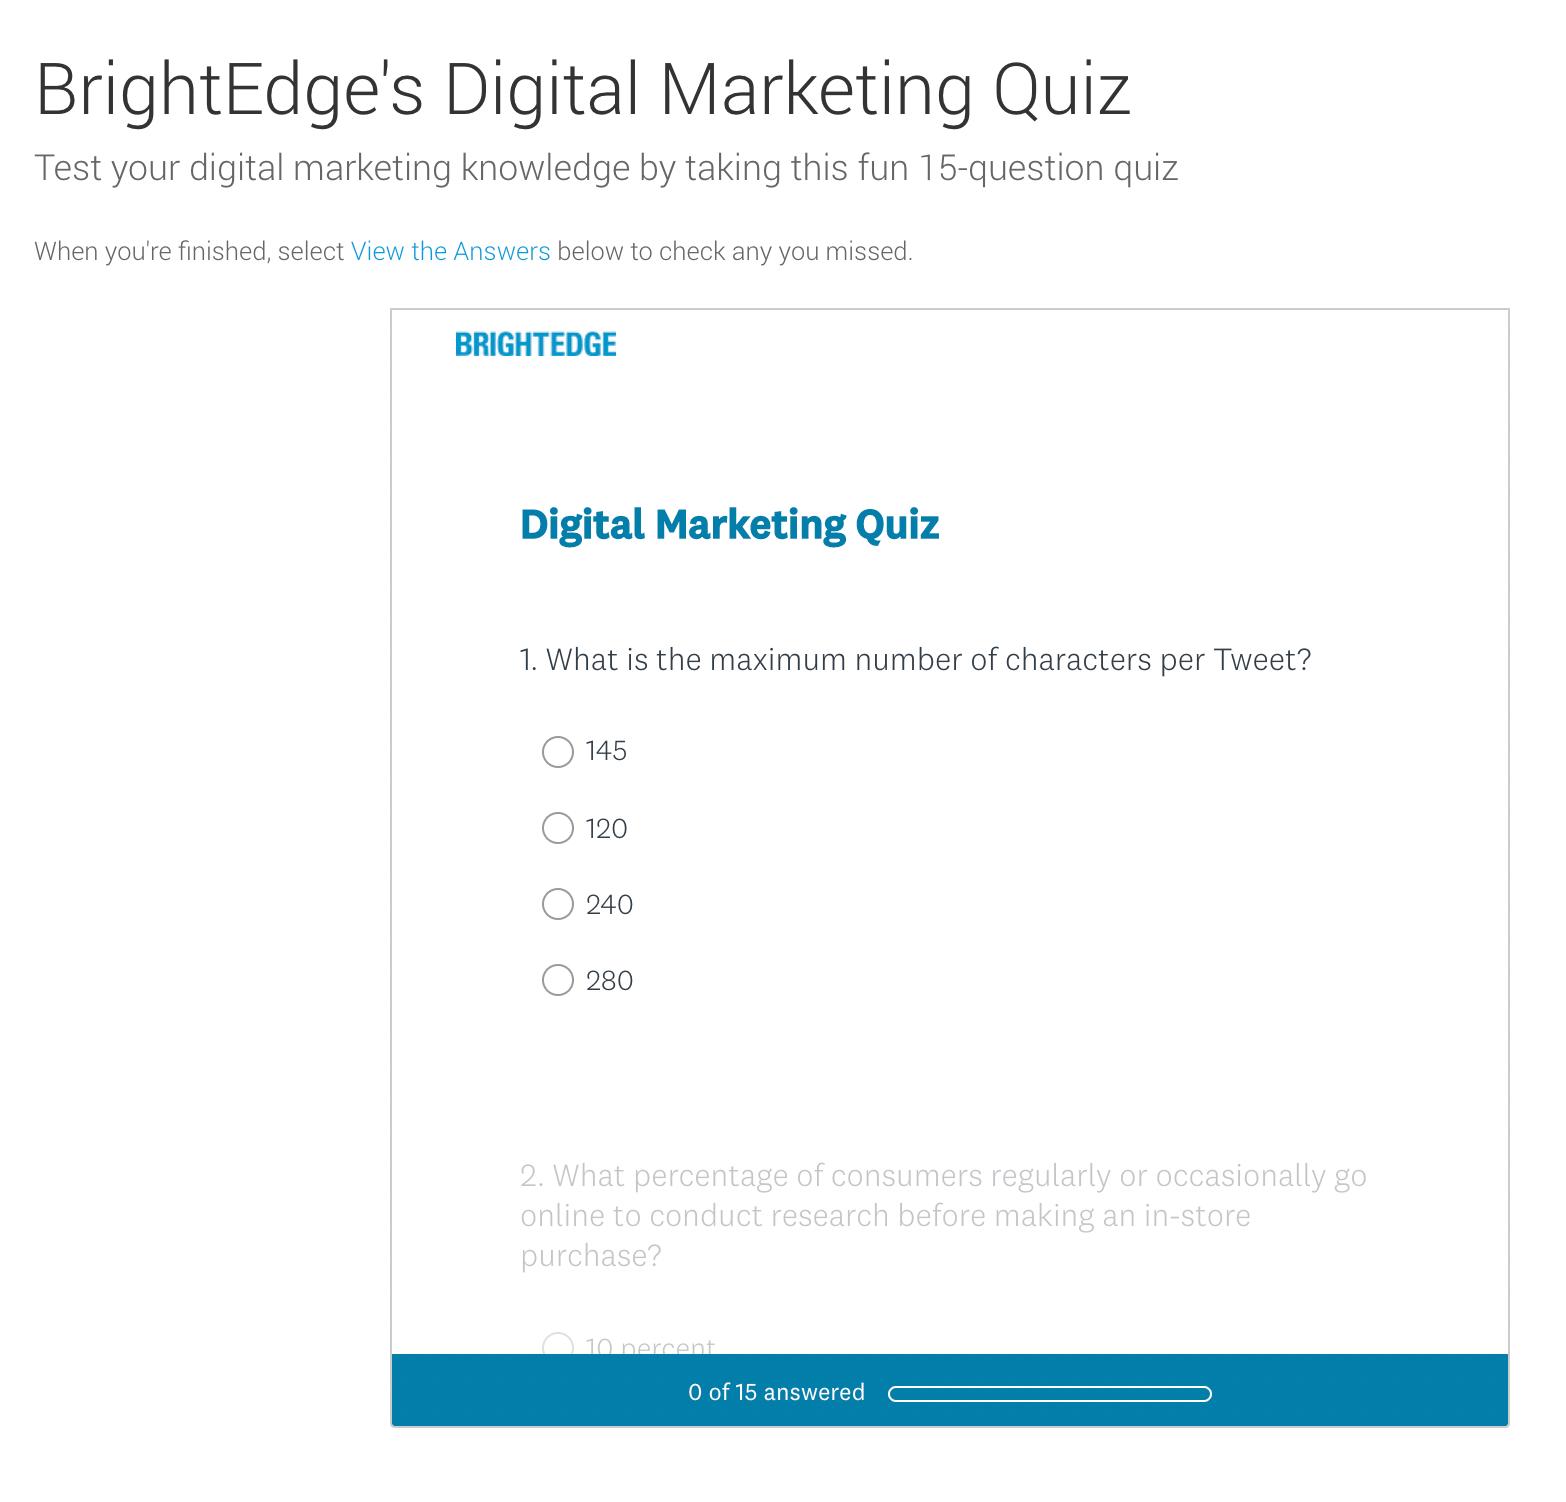 brightedge digital marketing quiz example